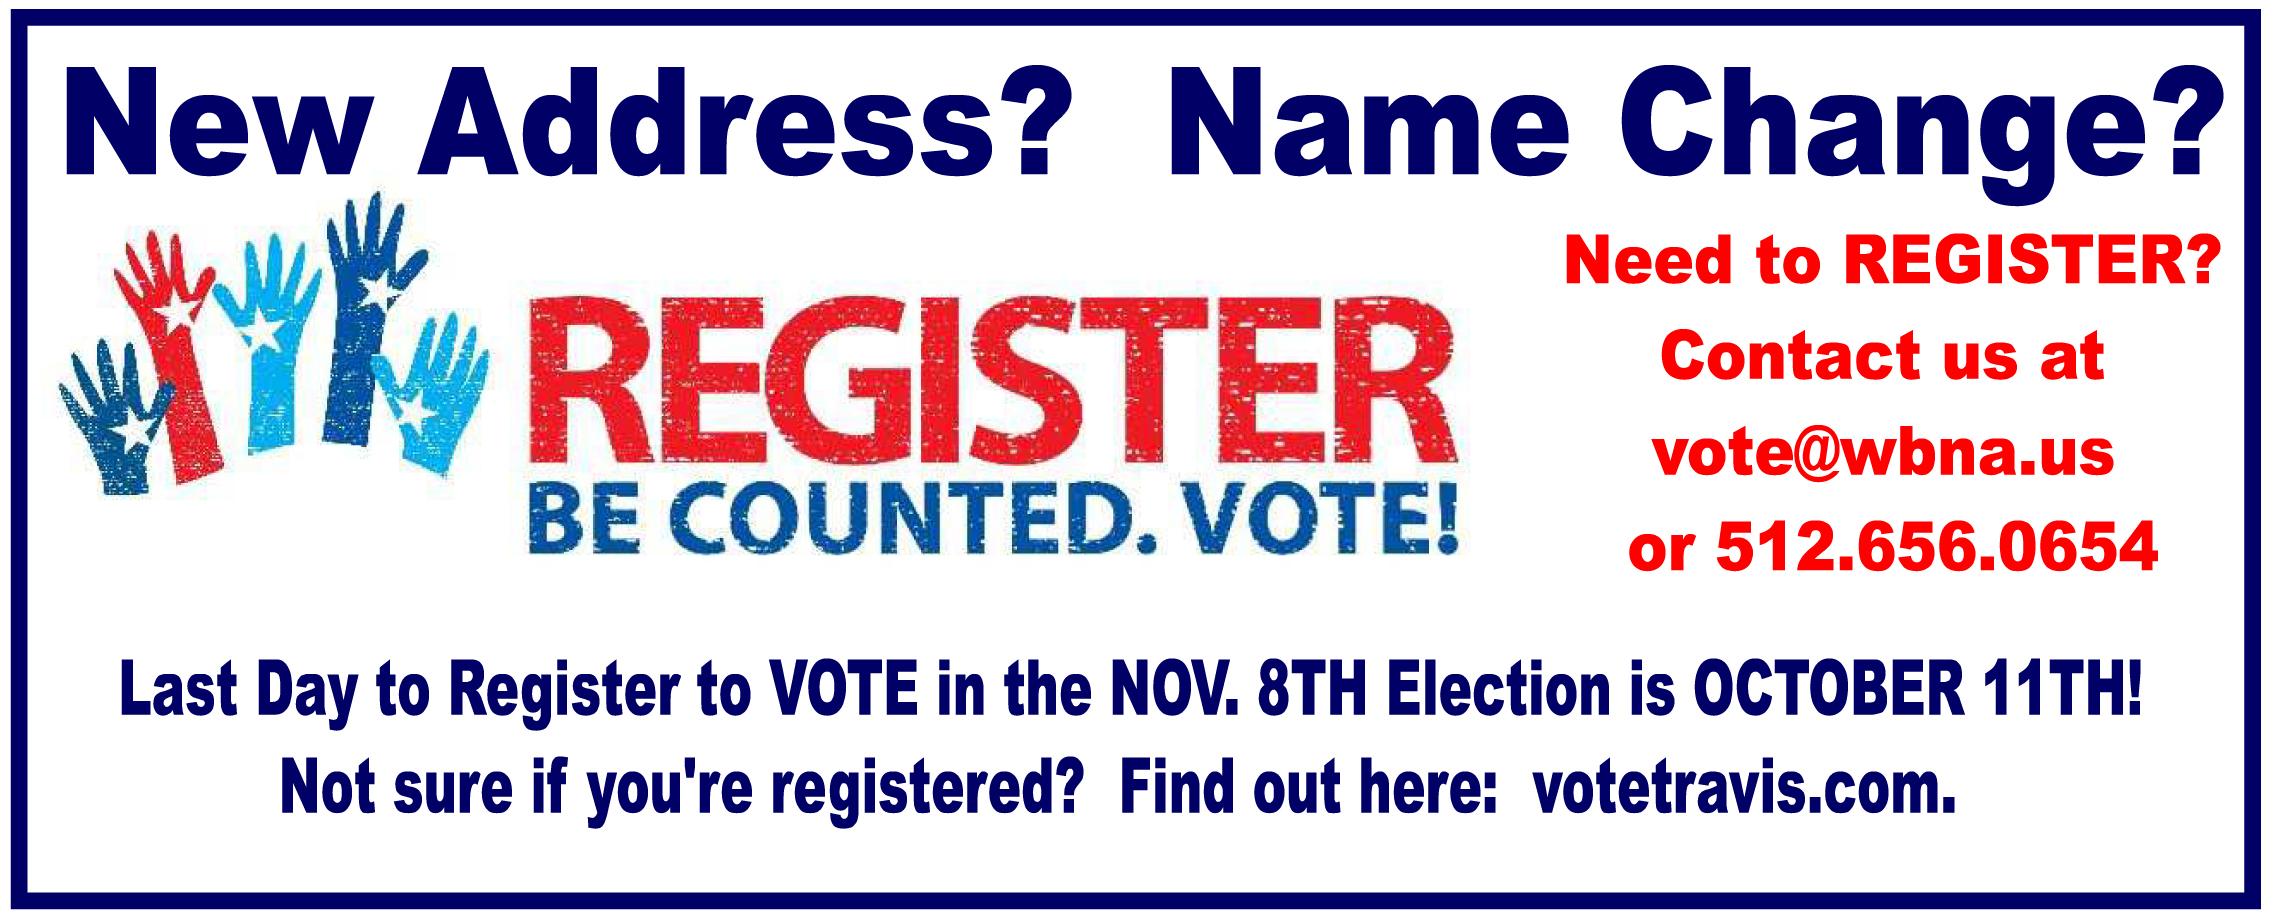 vote-last-day-to-register-banner-v2-copy